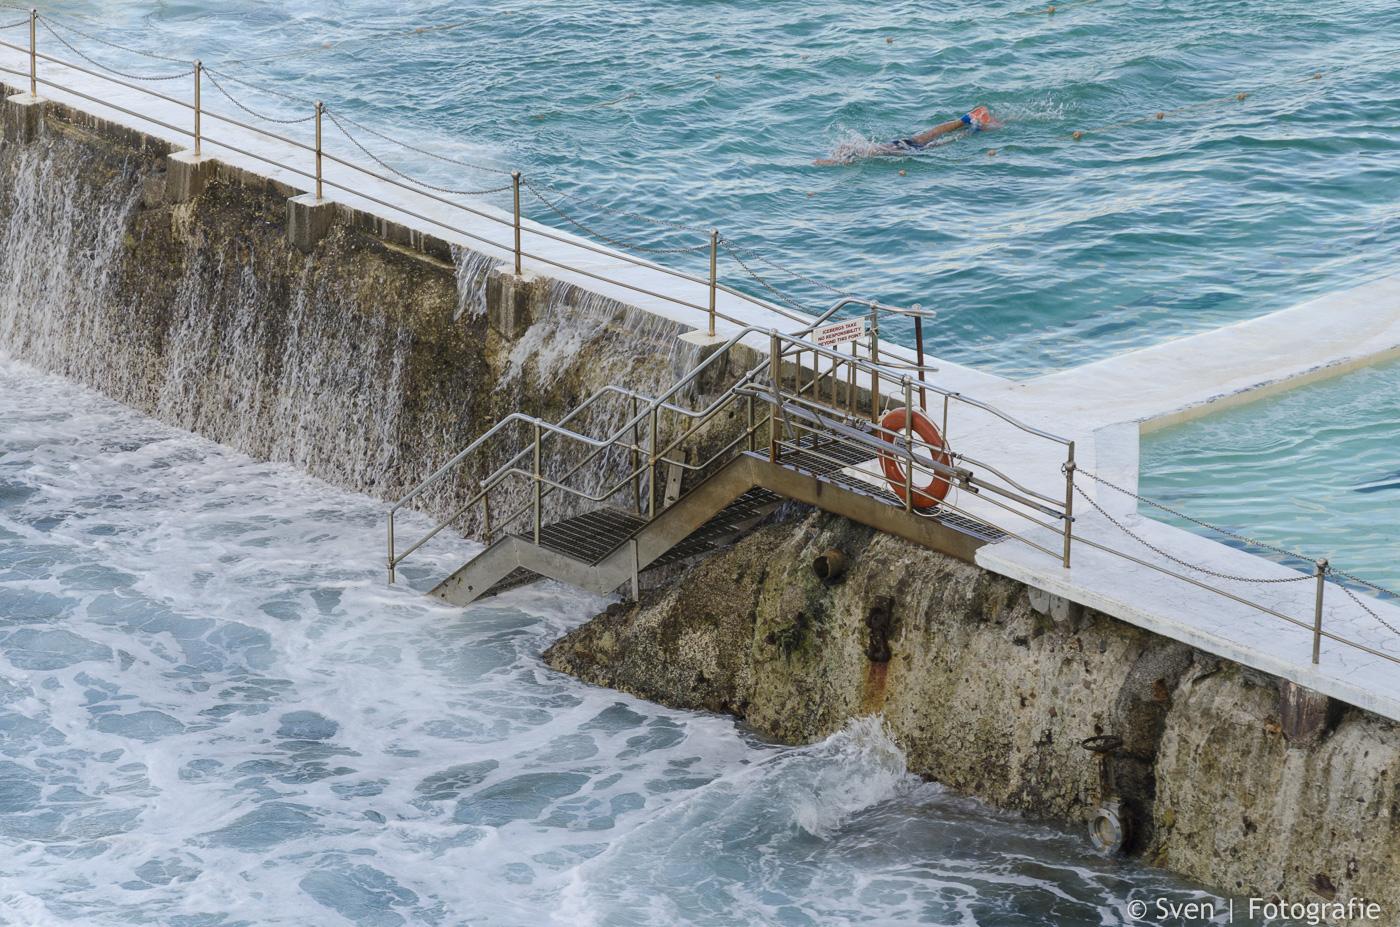 ocean baths, werk, aan, muur, verkocht, sven, australië, bondi, sydney, foto, canvas,